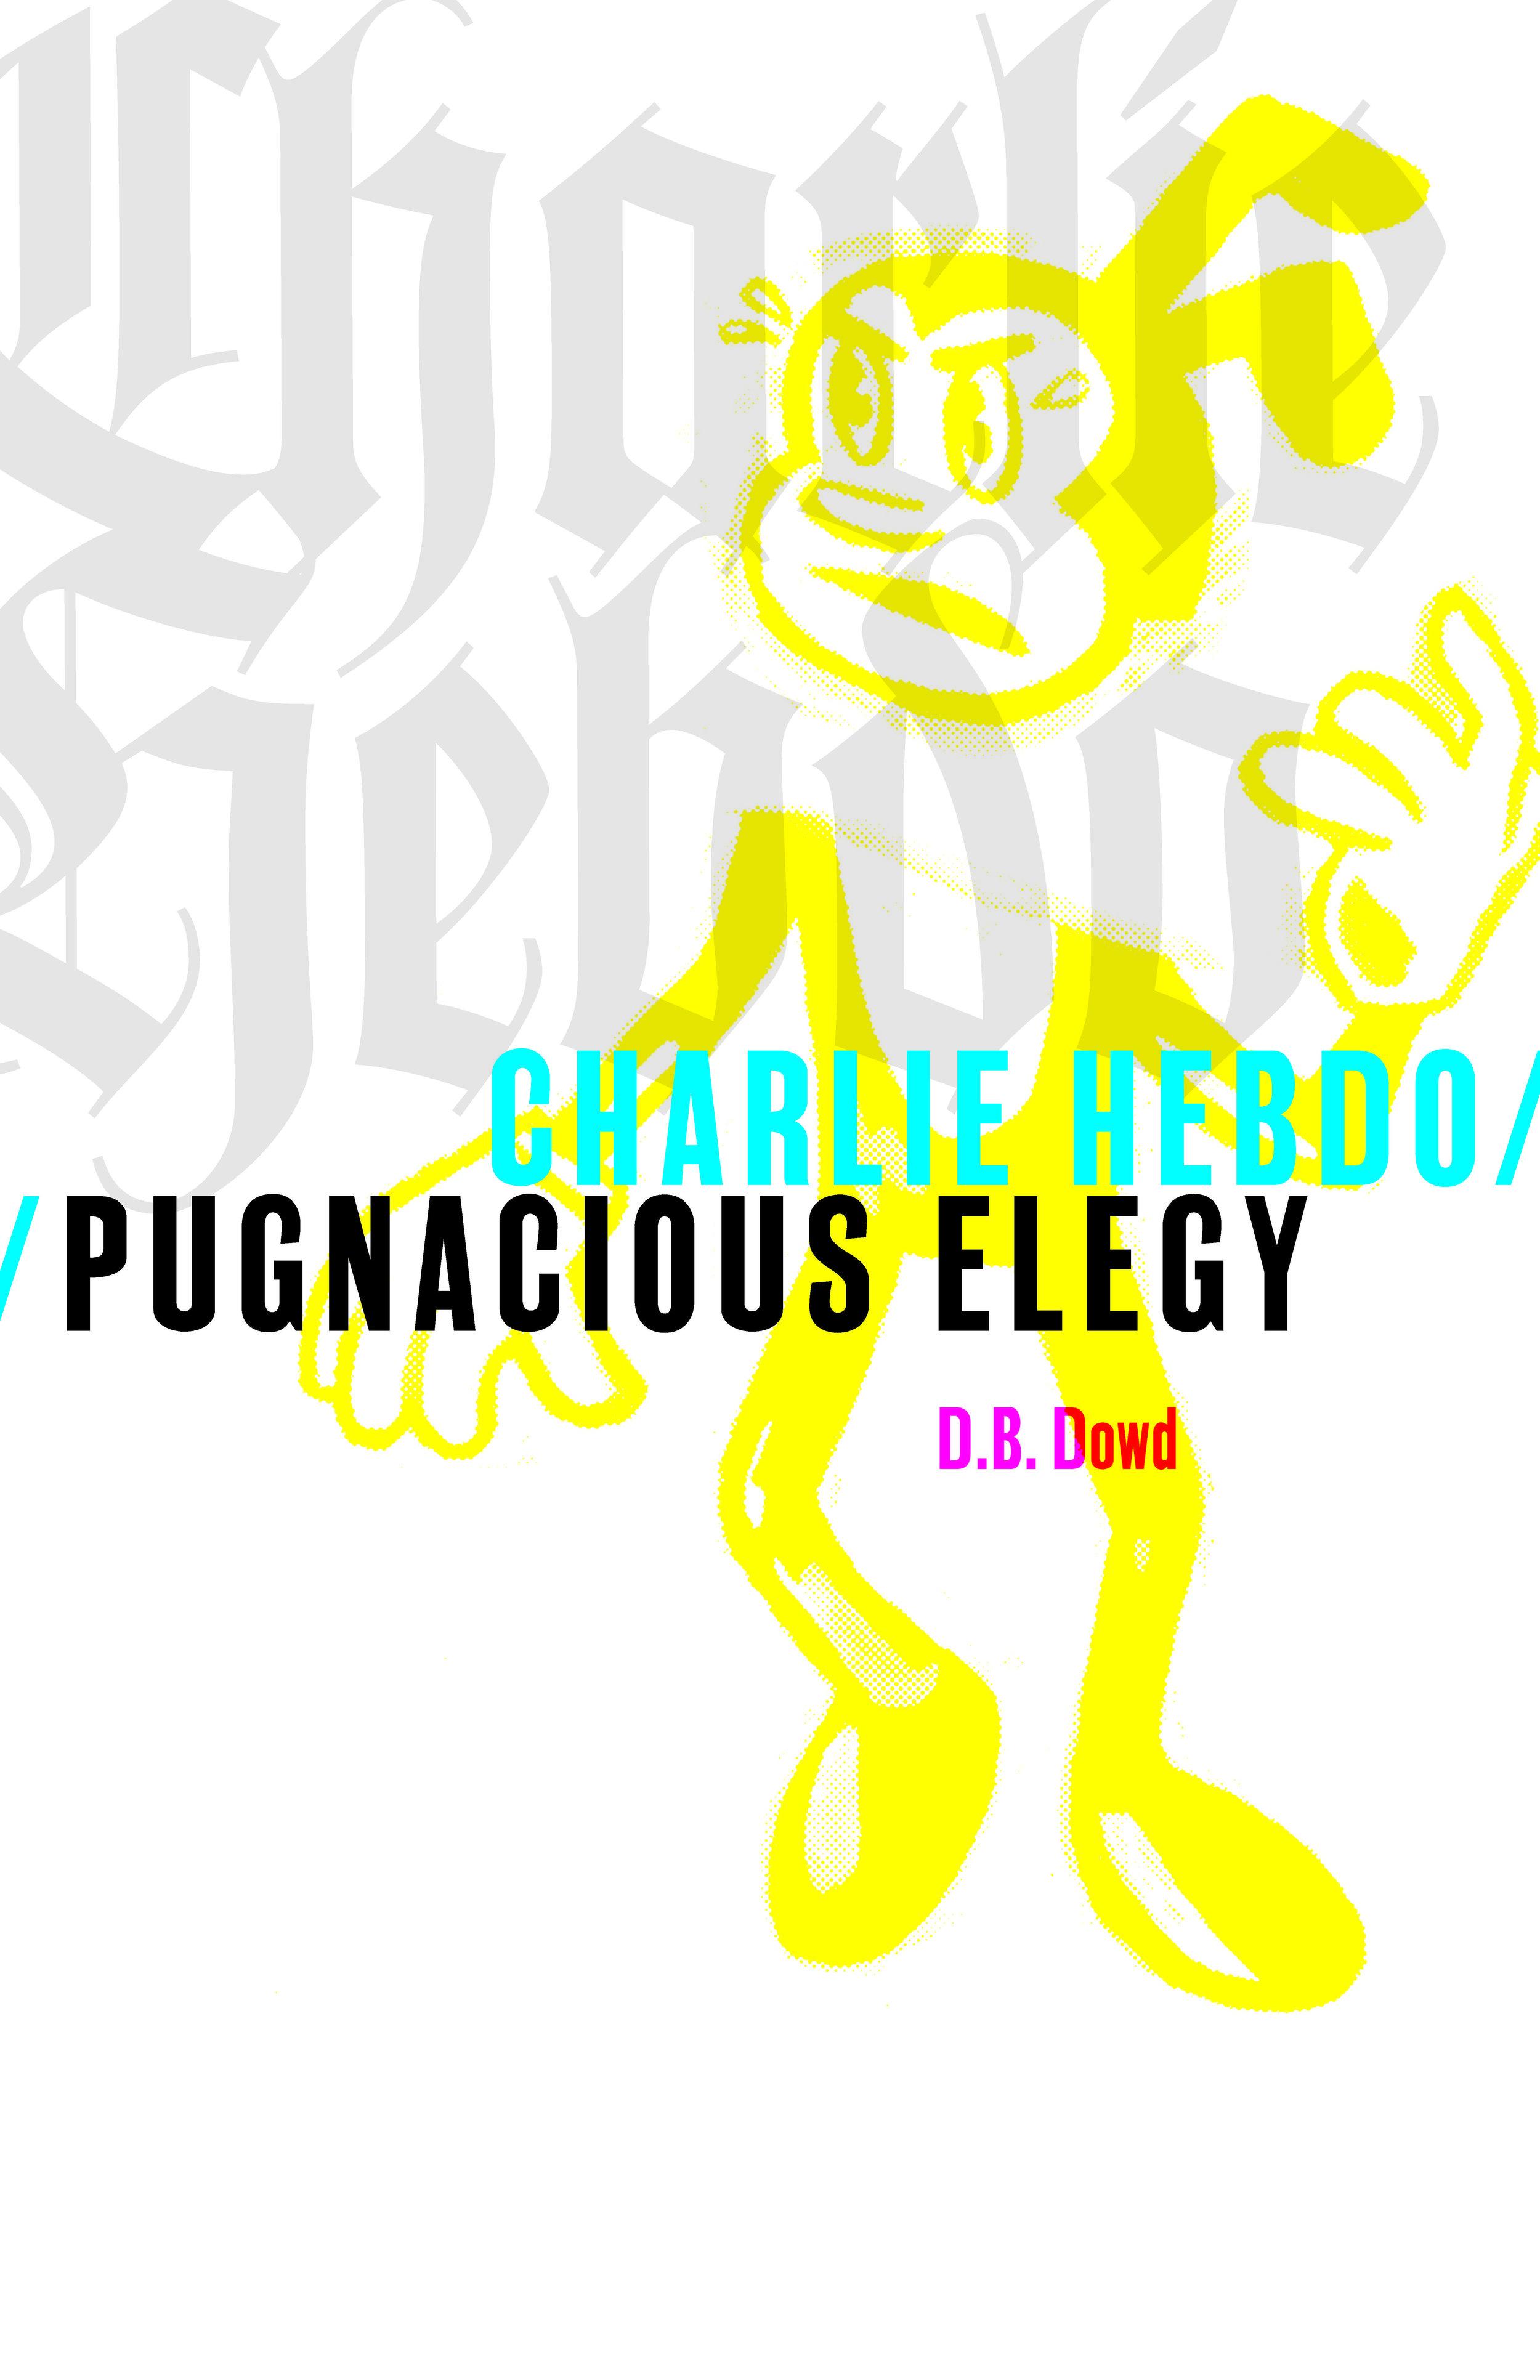 Dowd_Pugnacious_cover.jpg